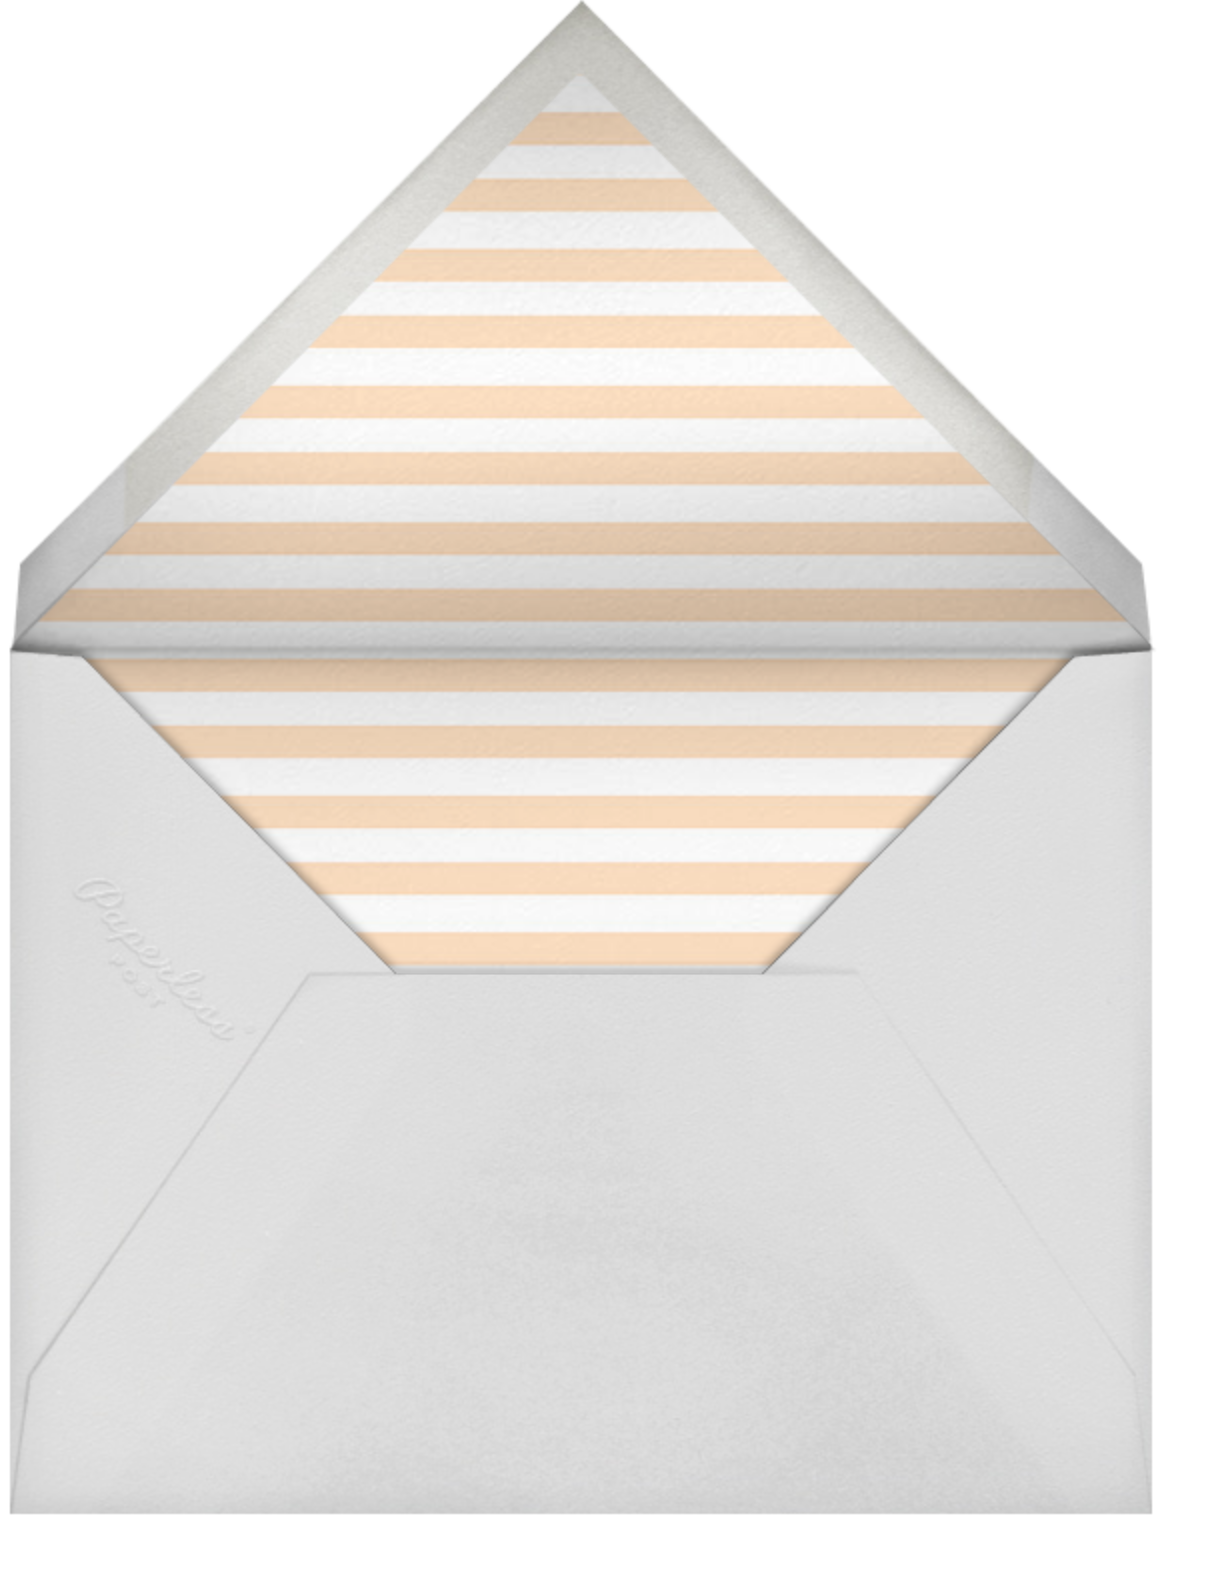 Bold Line - Green - The Indigo Bunting - All - envelope back